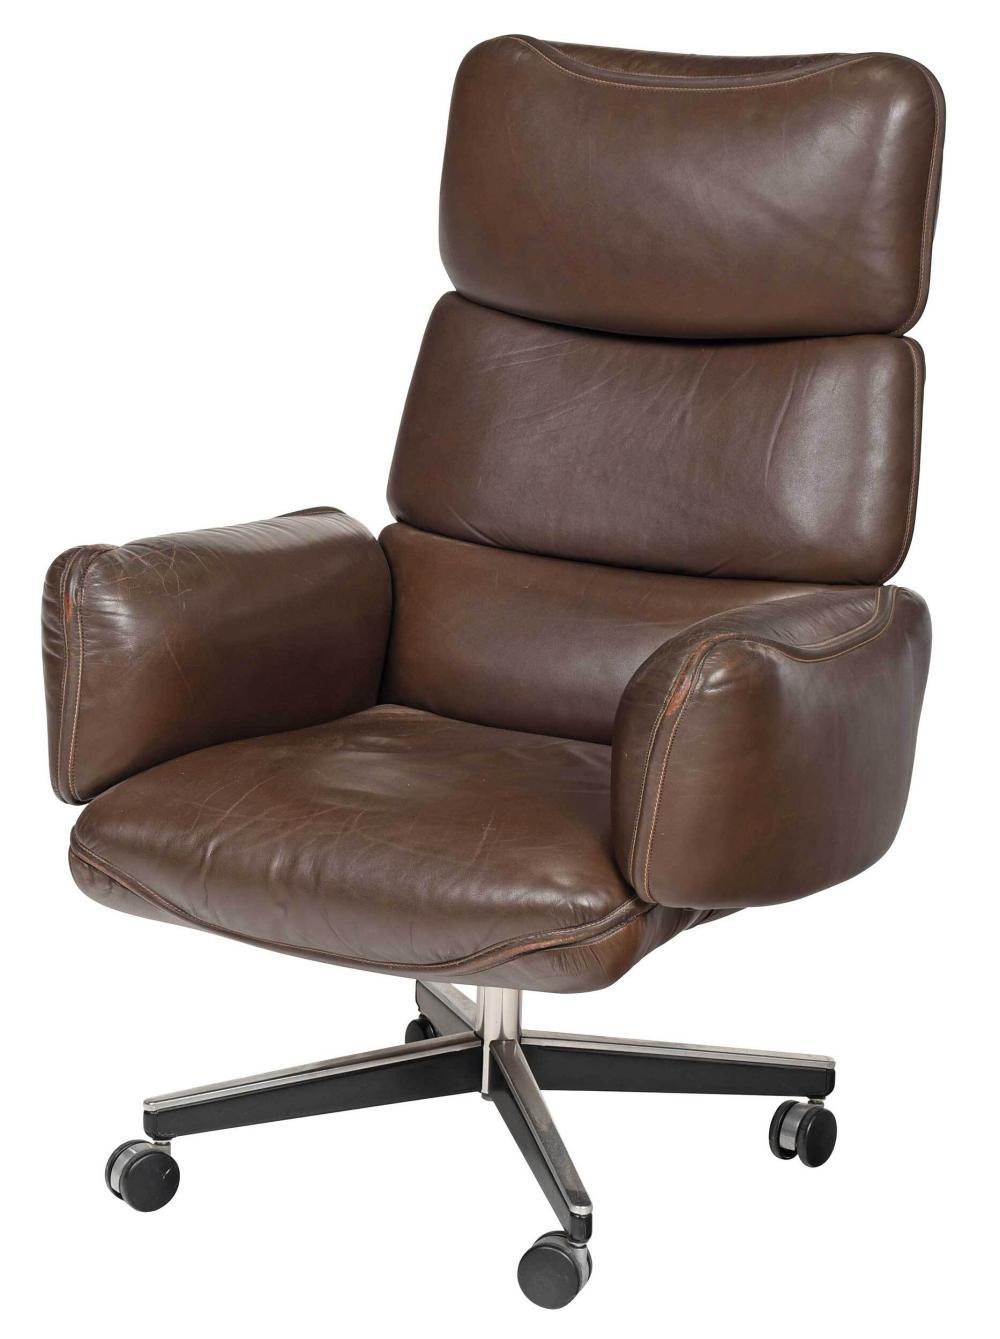 A Knoll Leather Executive Desk Chair